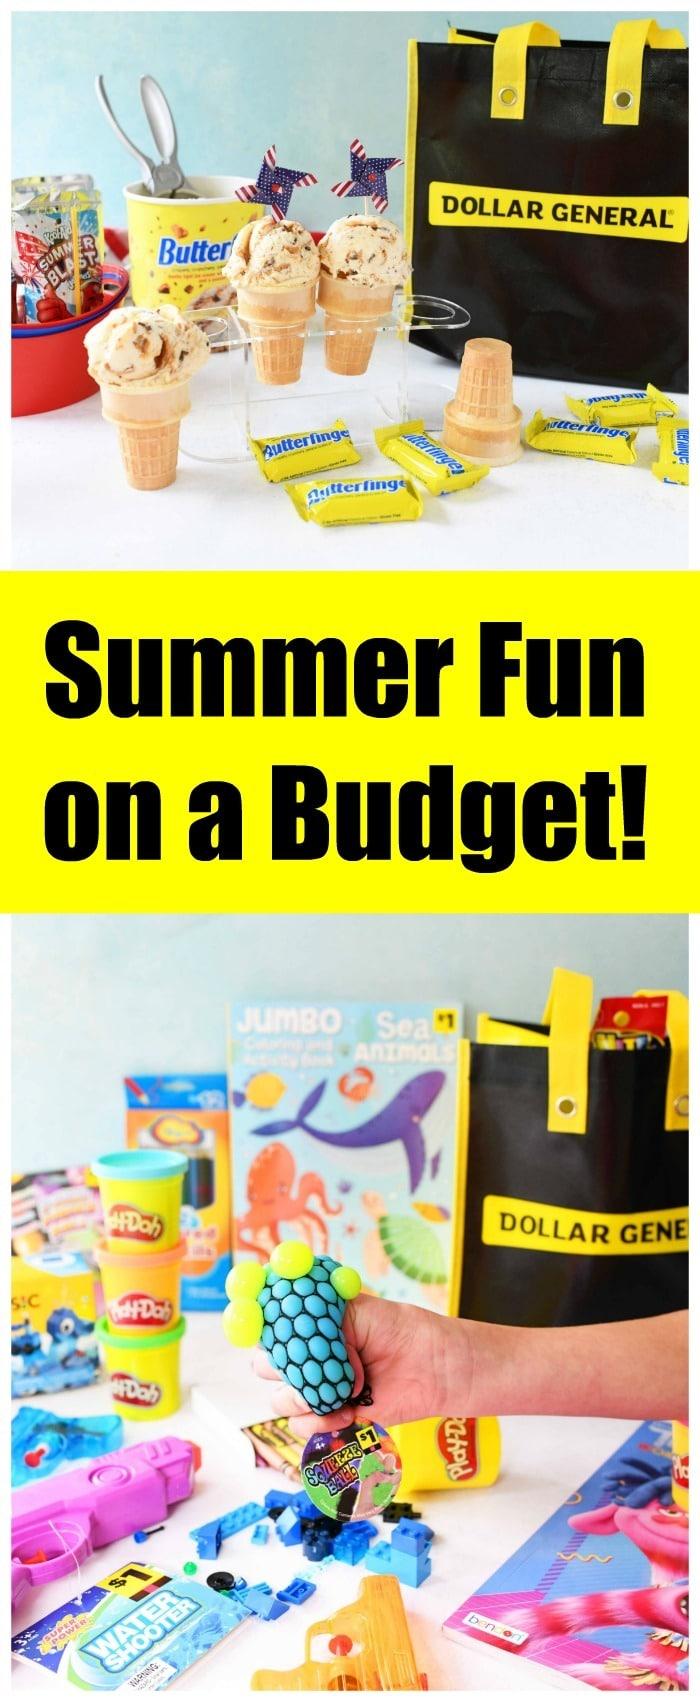 Summer Fun Essentials on a Budget